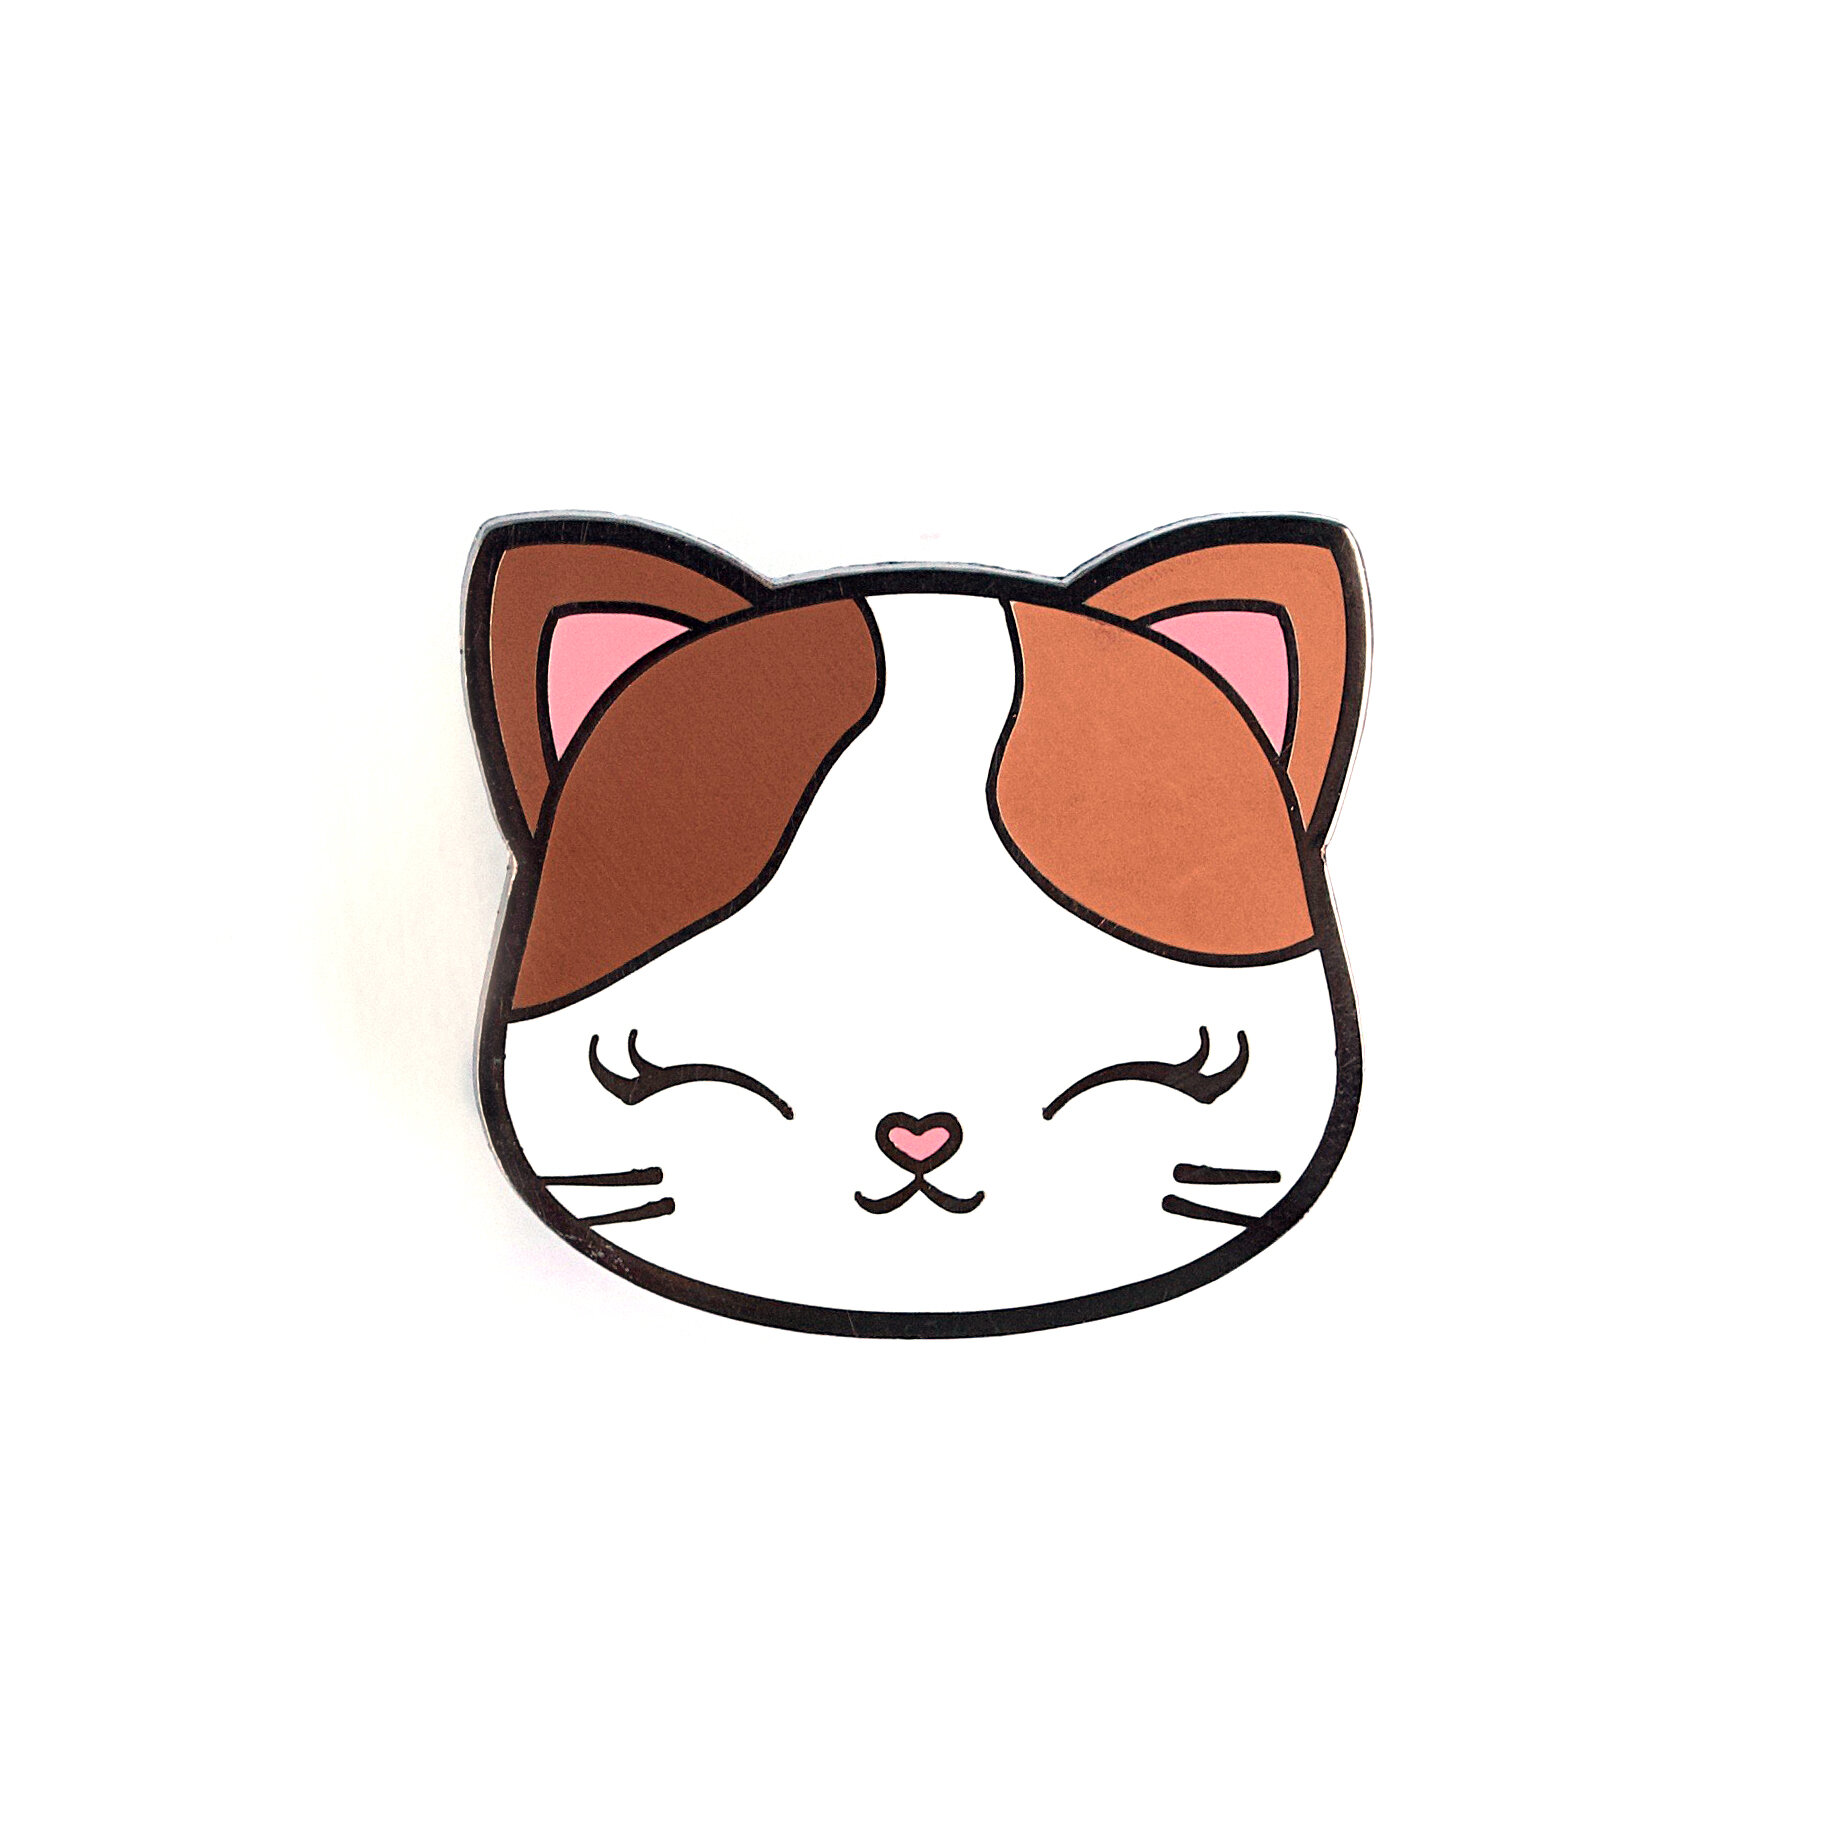 P38 - Kitty Face Pin